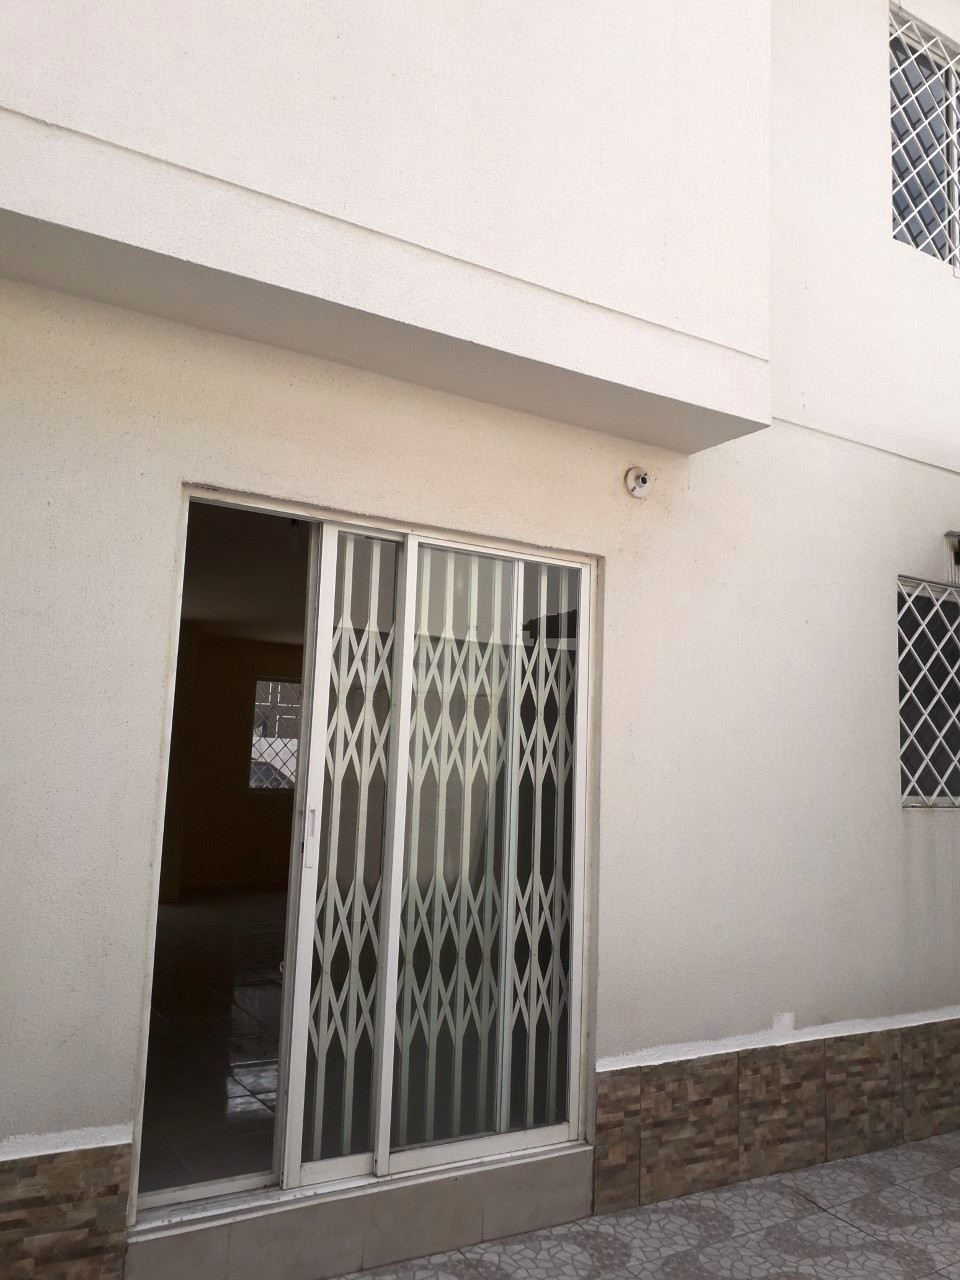 alquiler malaga meza 2 puerta patio